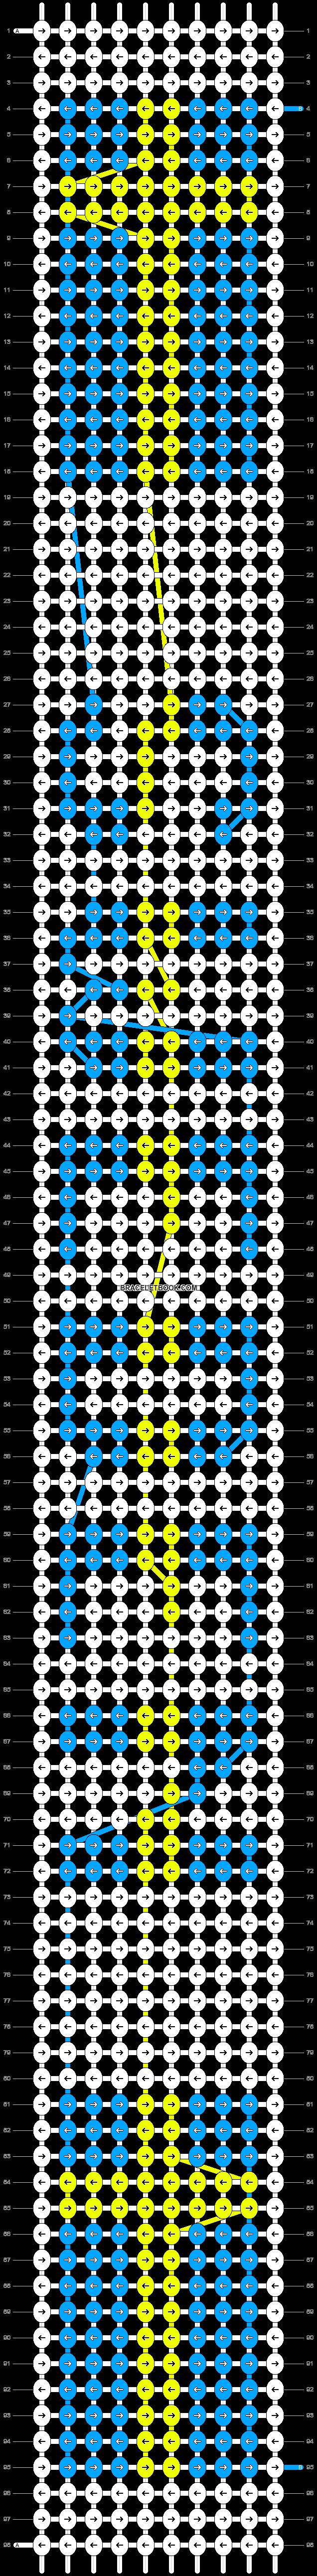 Alpha pattern #31155 variation #20085 pattern